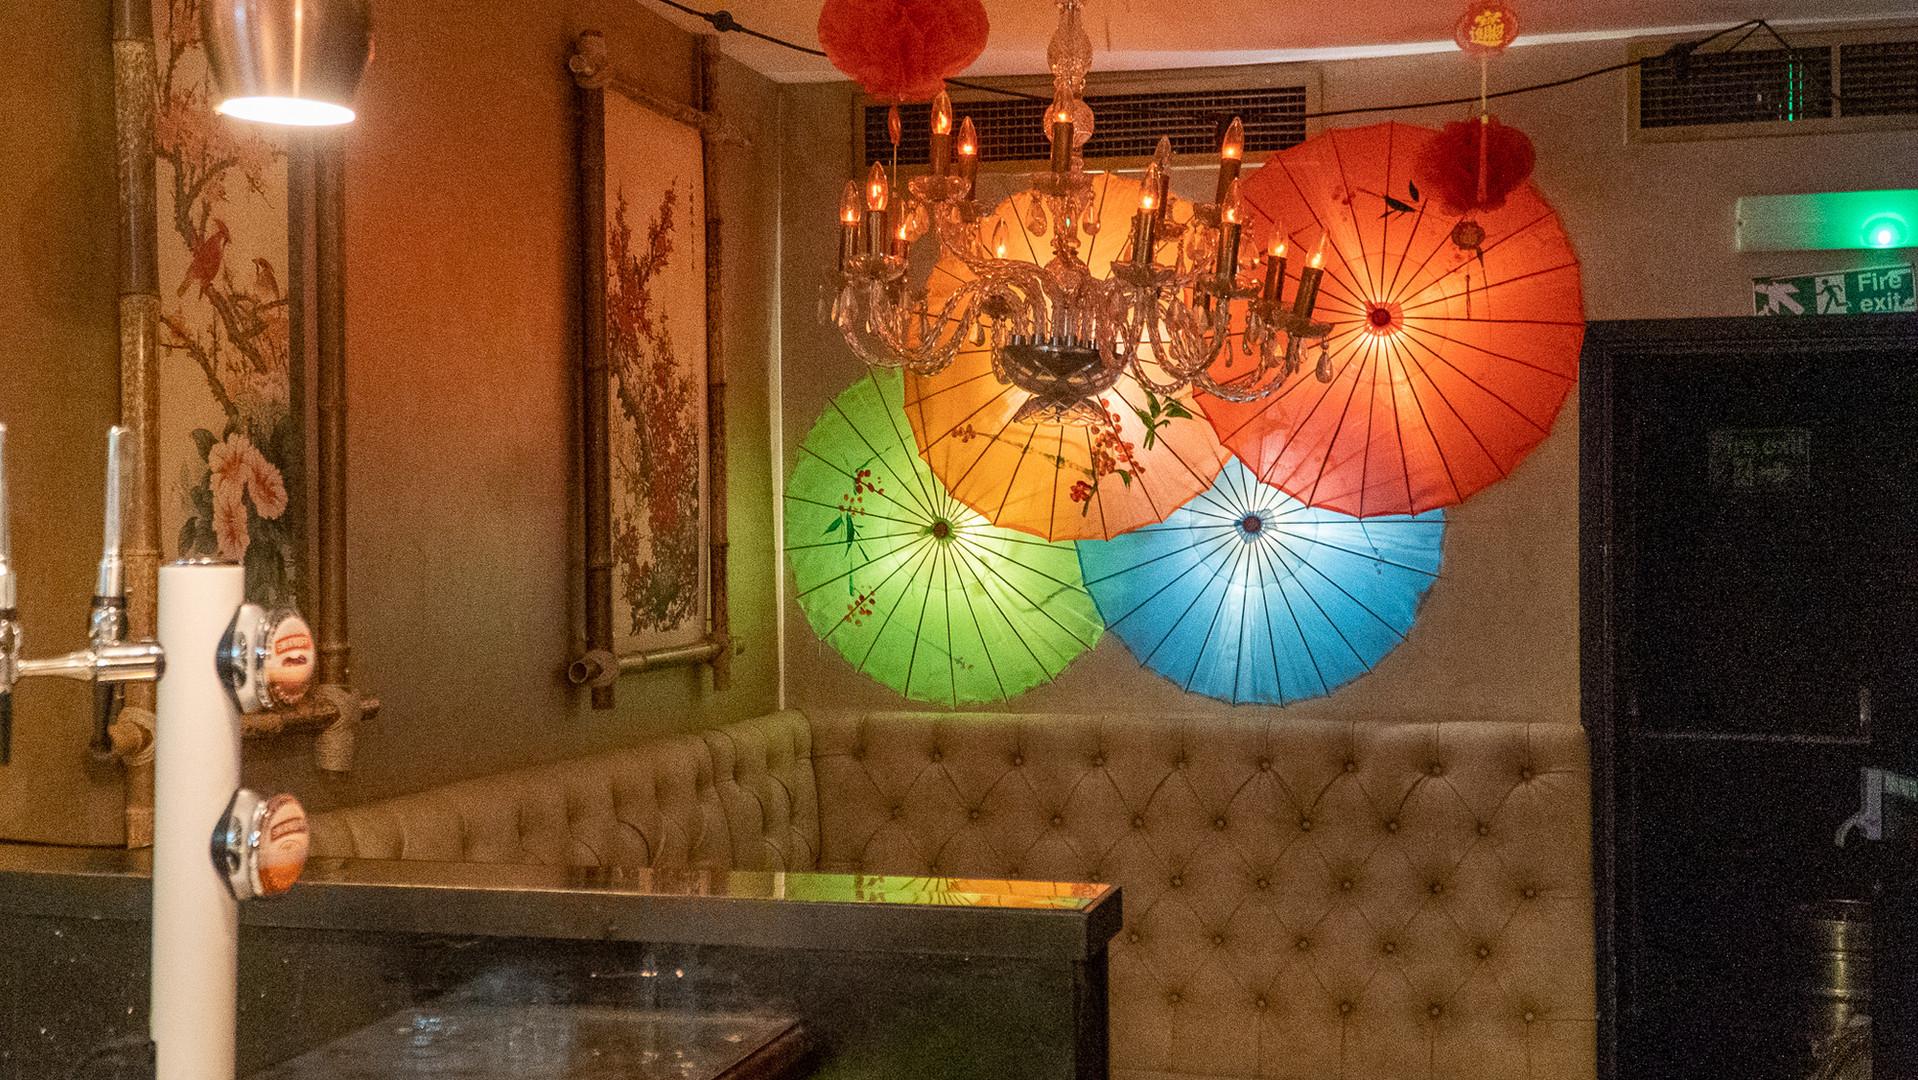 Tai Pan Alley - Asian Street food court